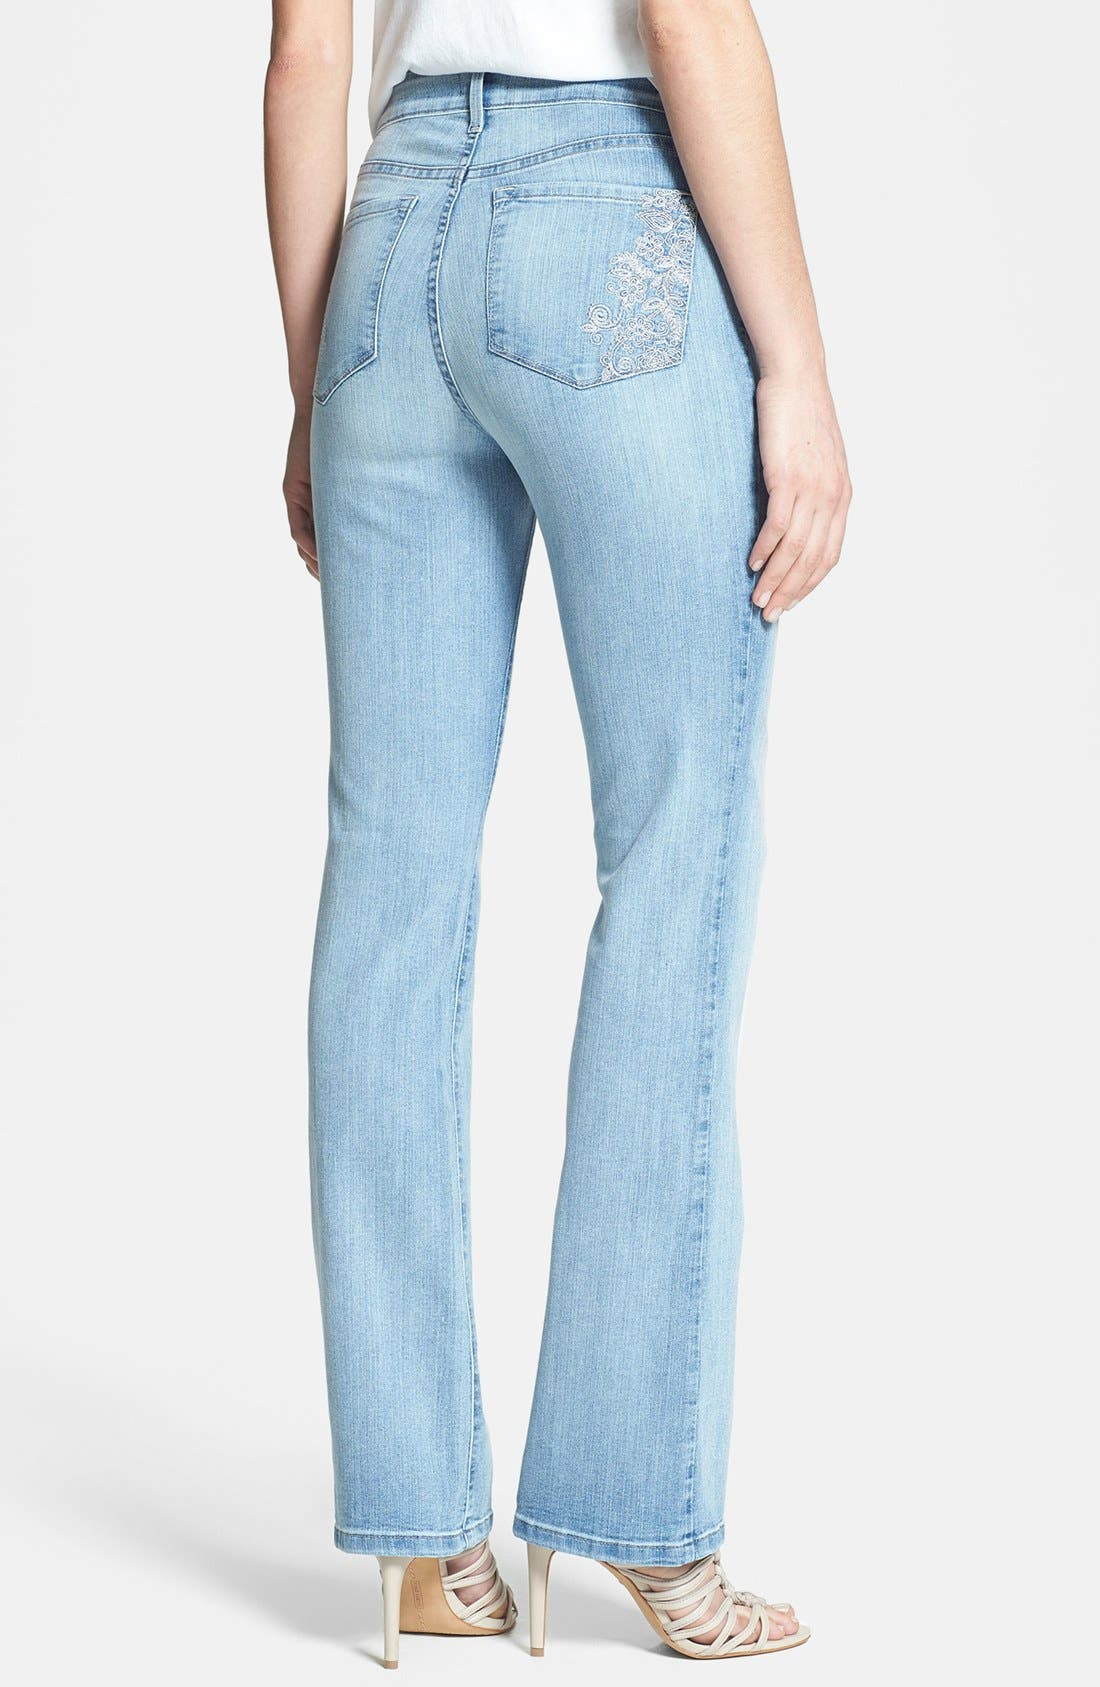 Alternate Image 2  - NYDJ 'Barbara' Stretch Bootcut Jeans (Palos Verdes)